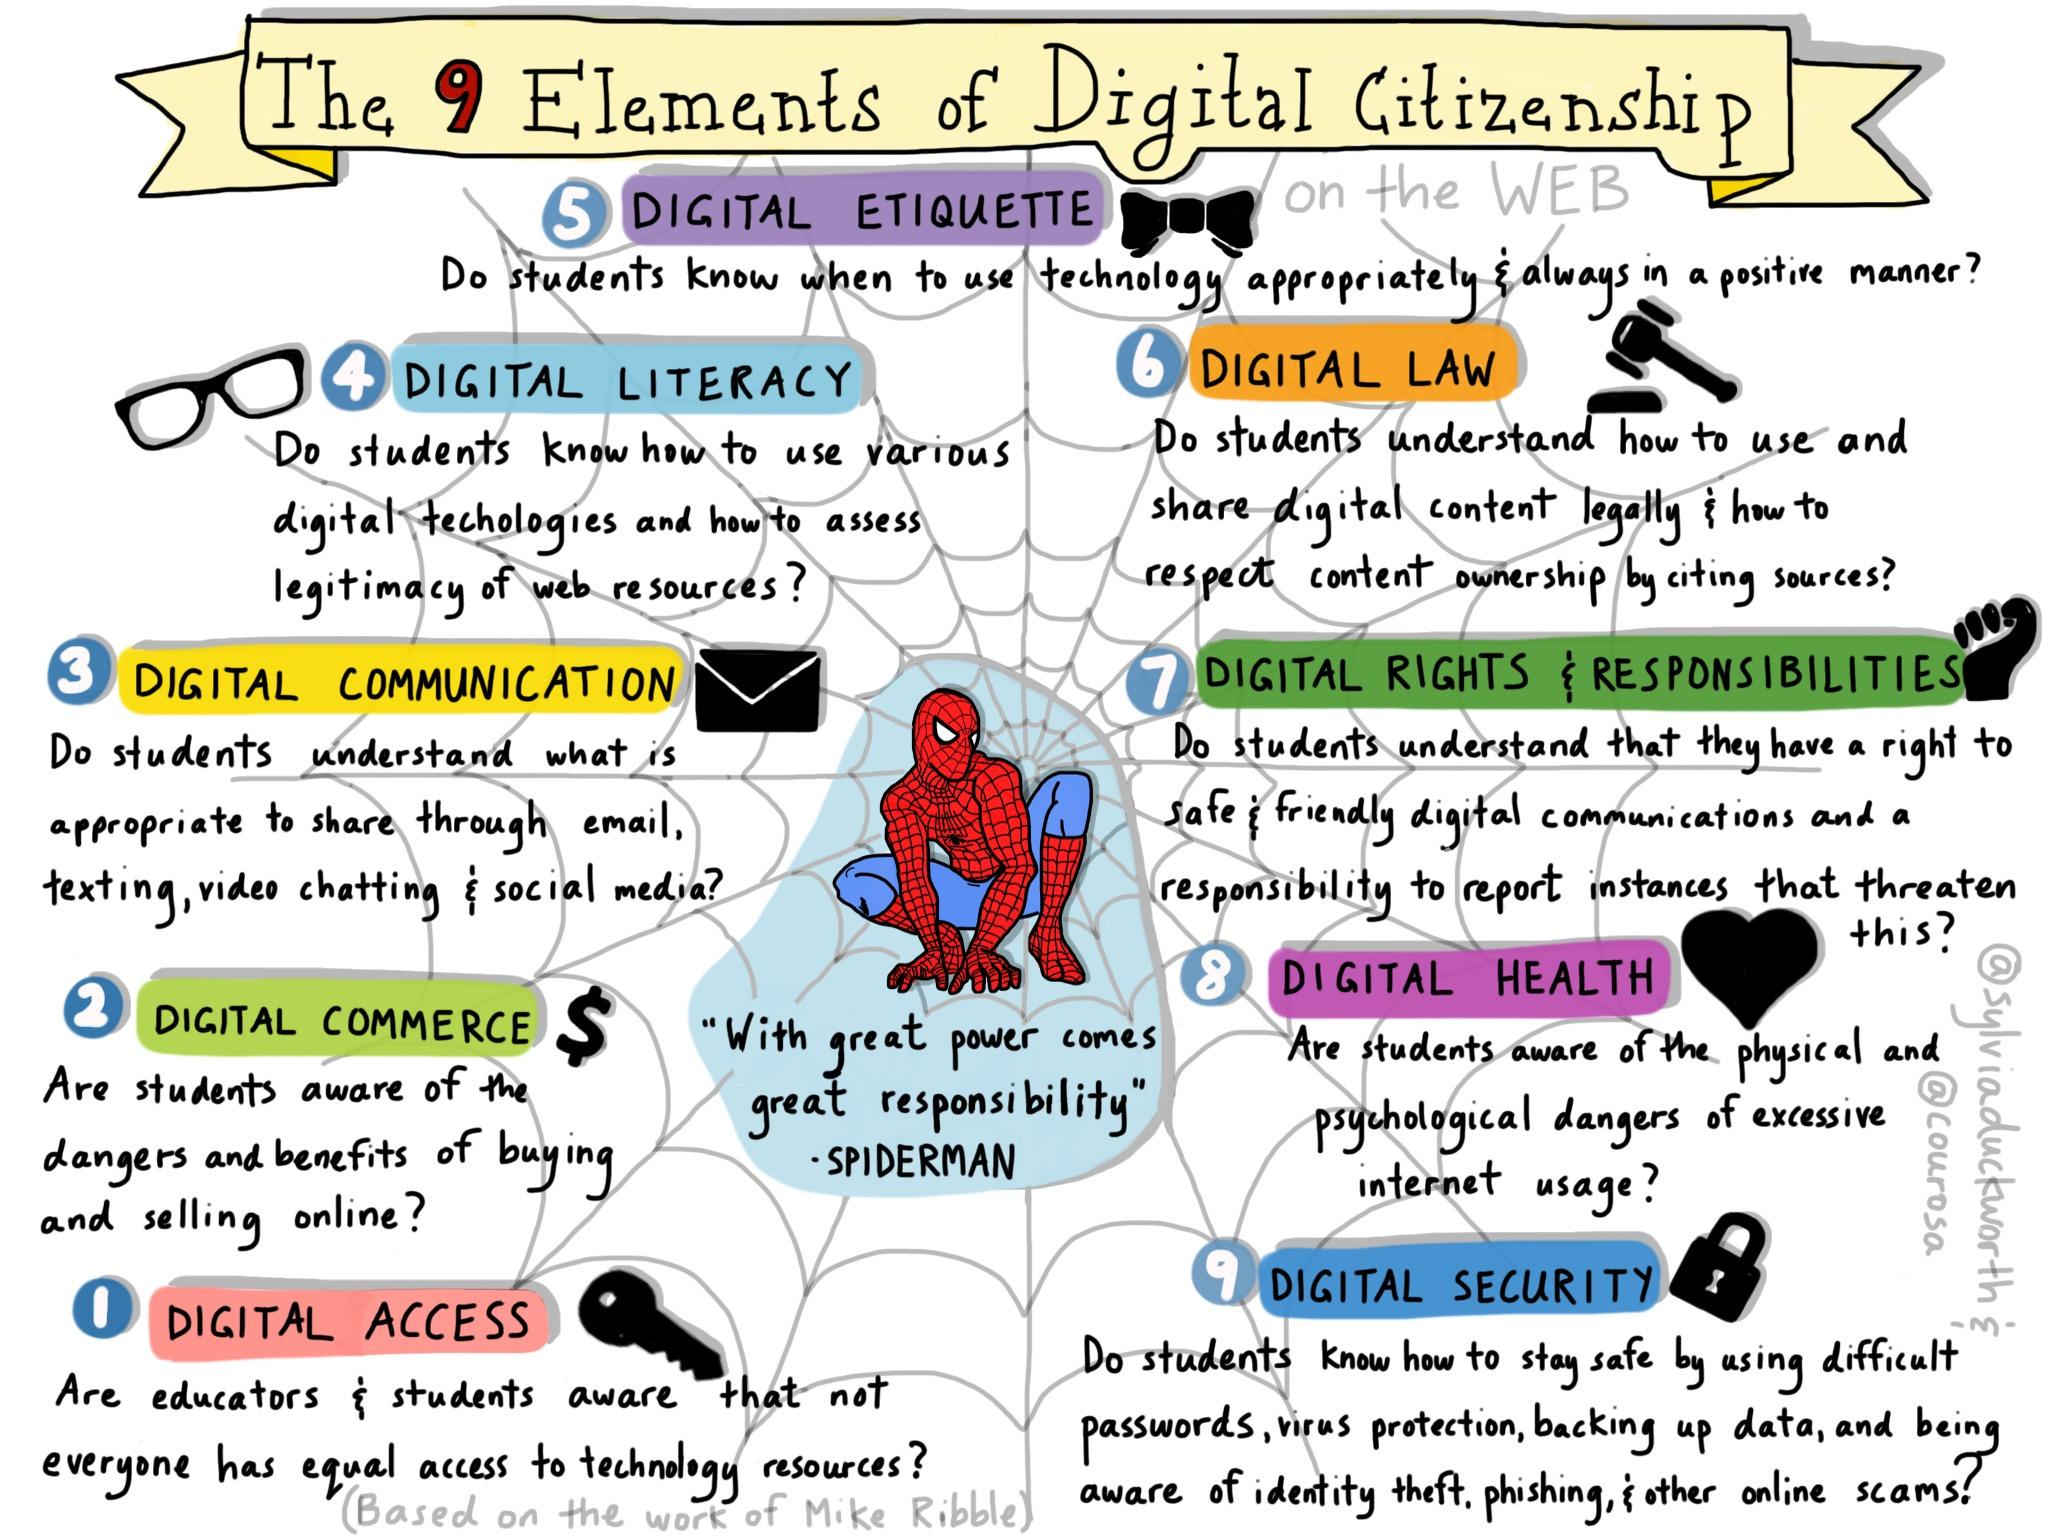 9 Elements of Digital Citizenship  Printable Poster